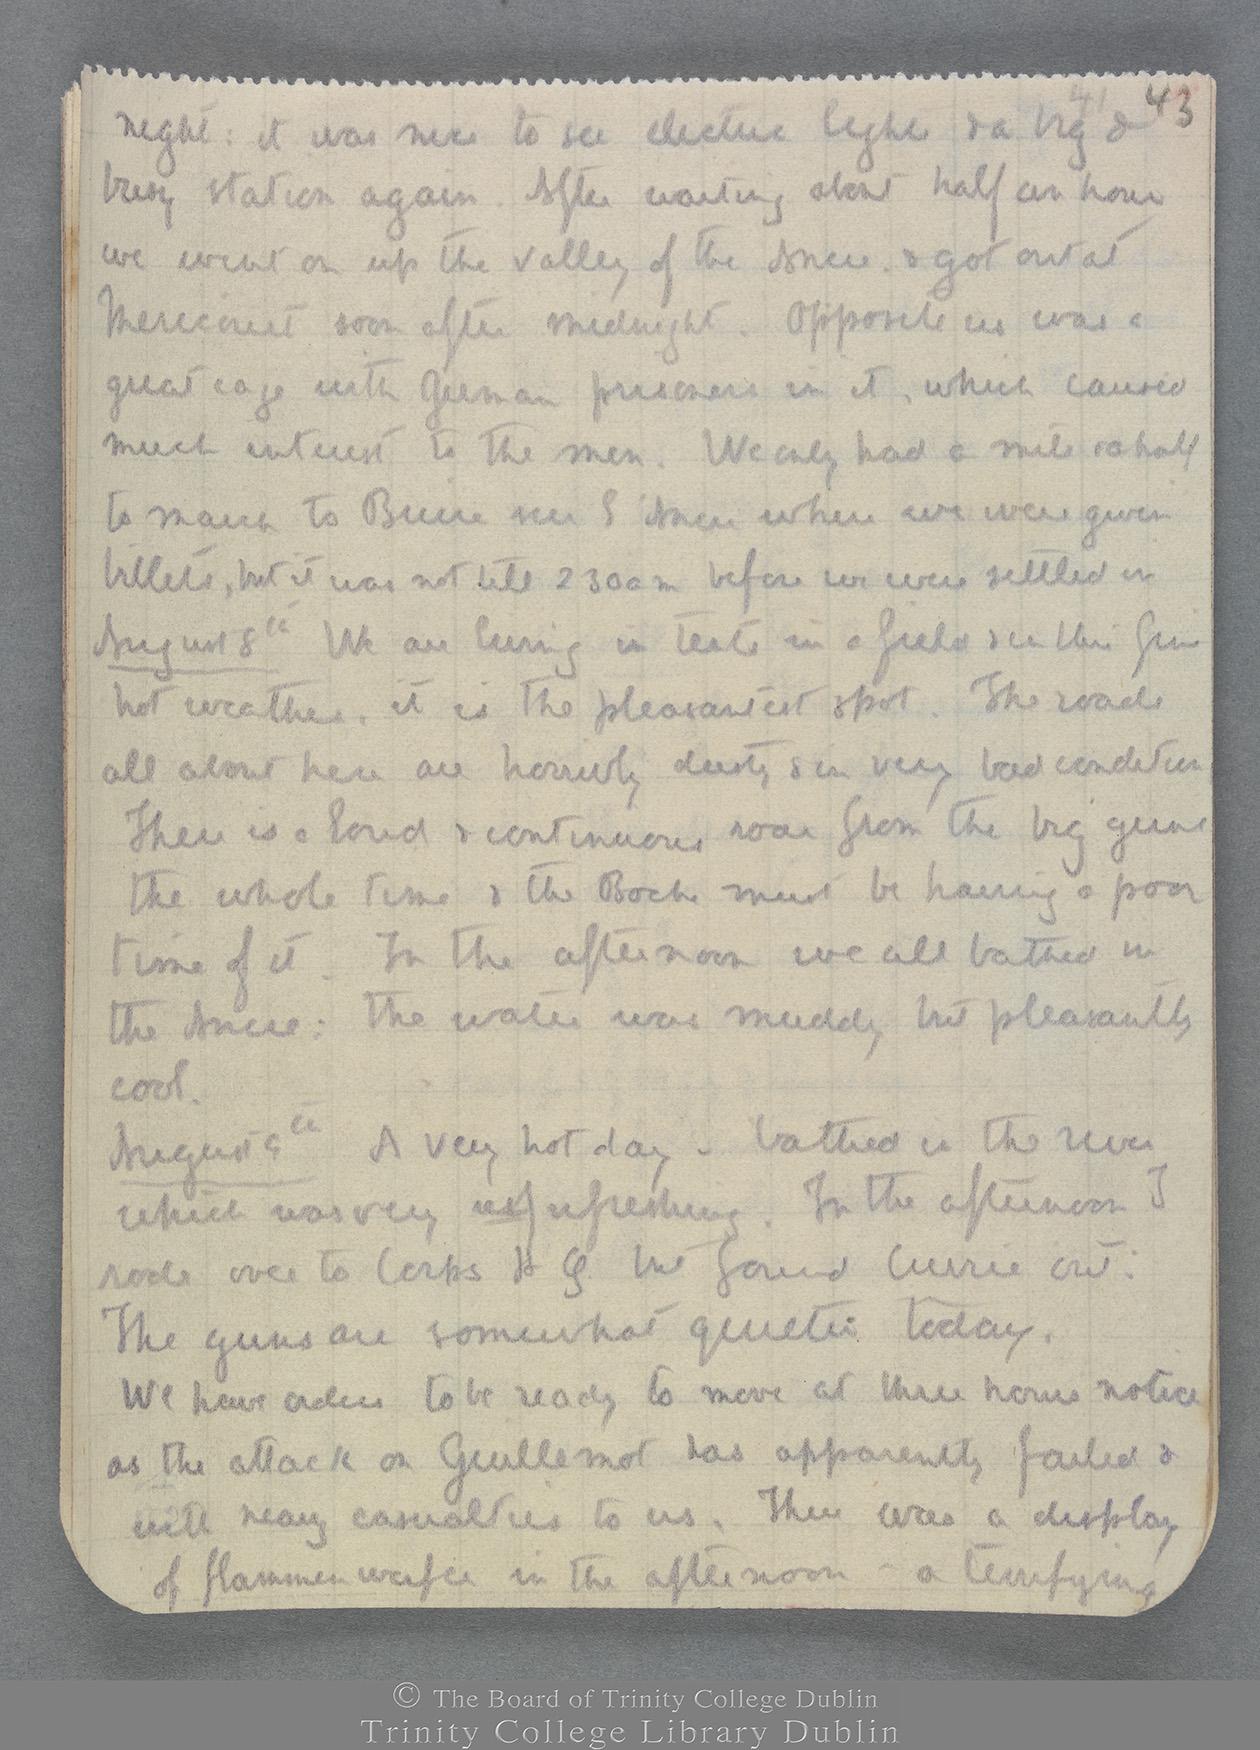 TCD MS 10821 folio 43 recto